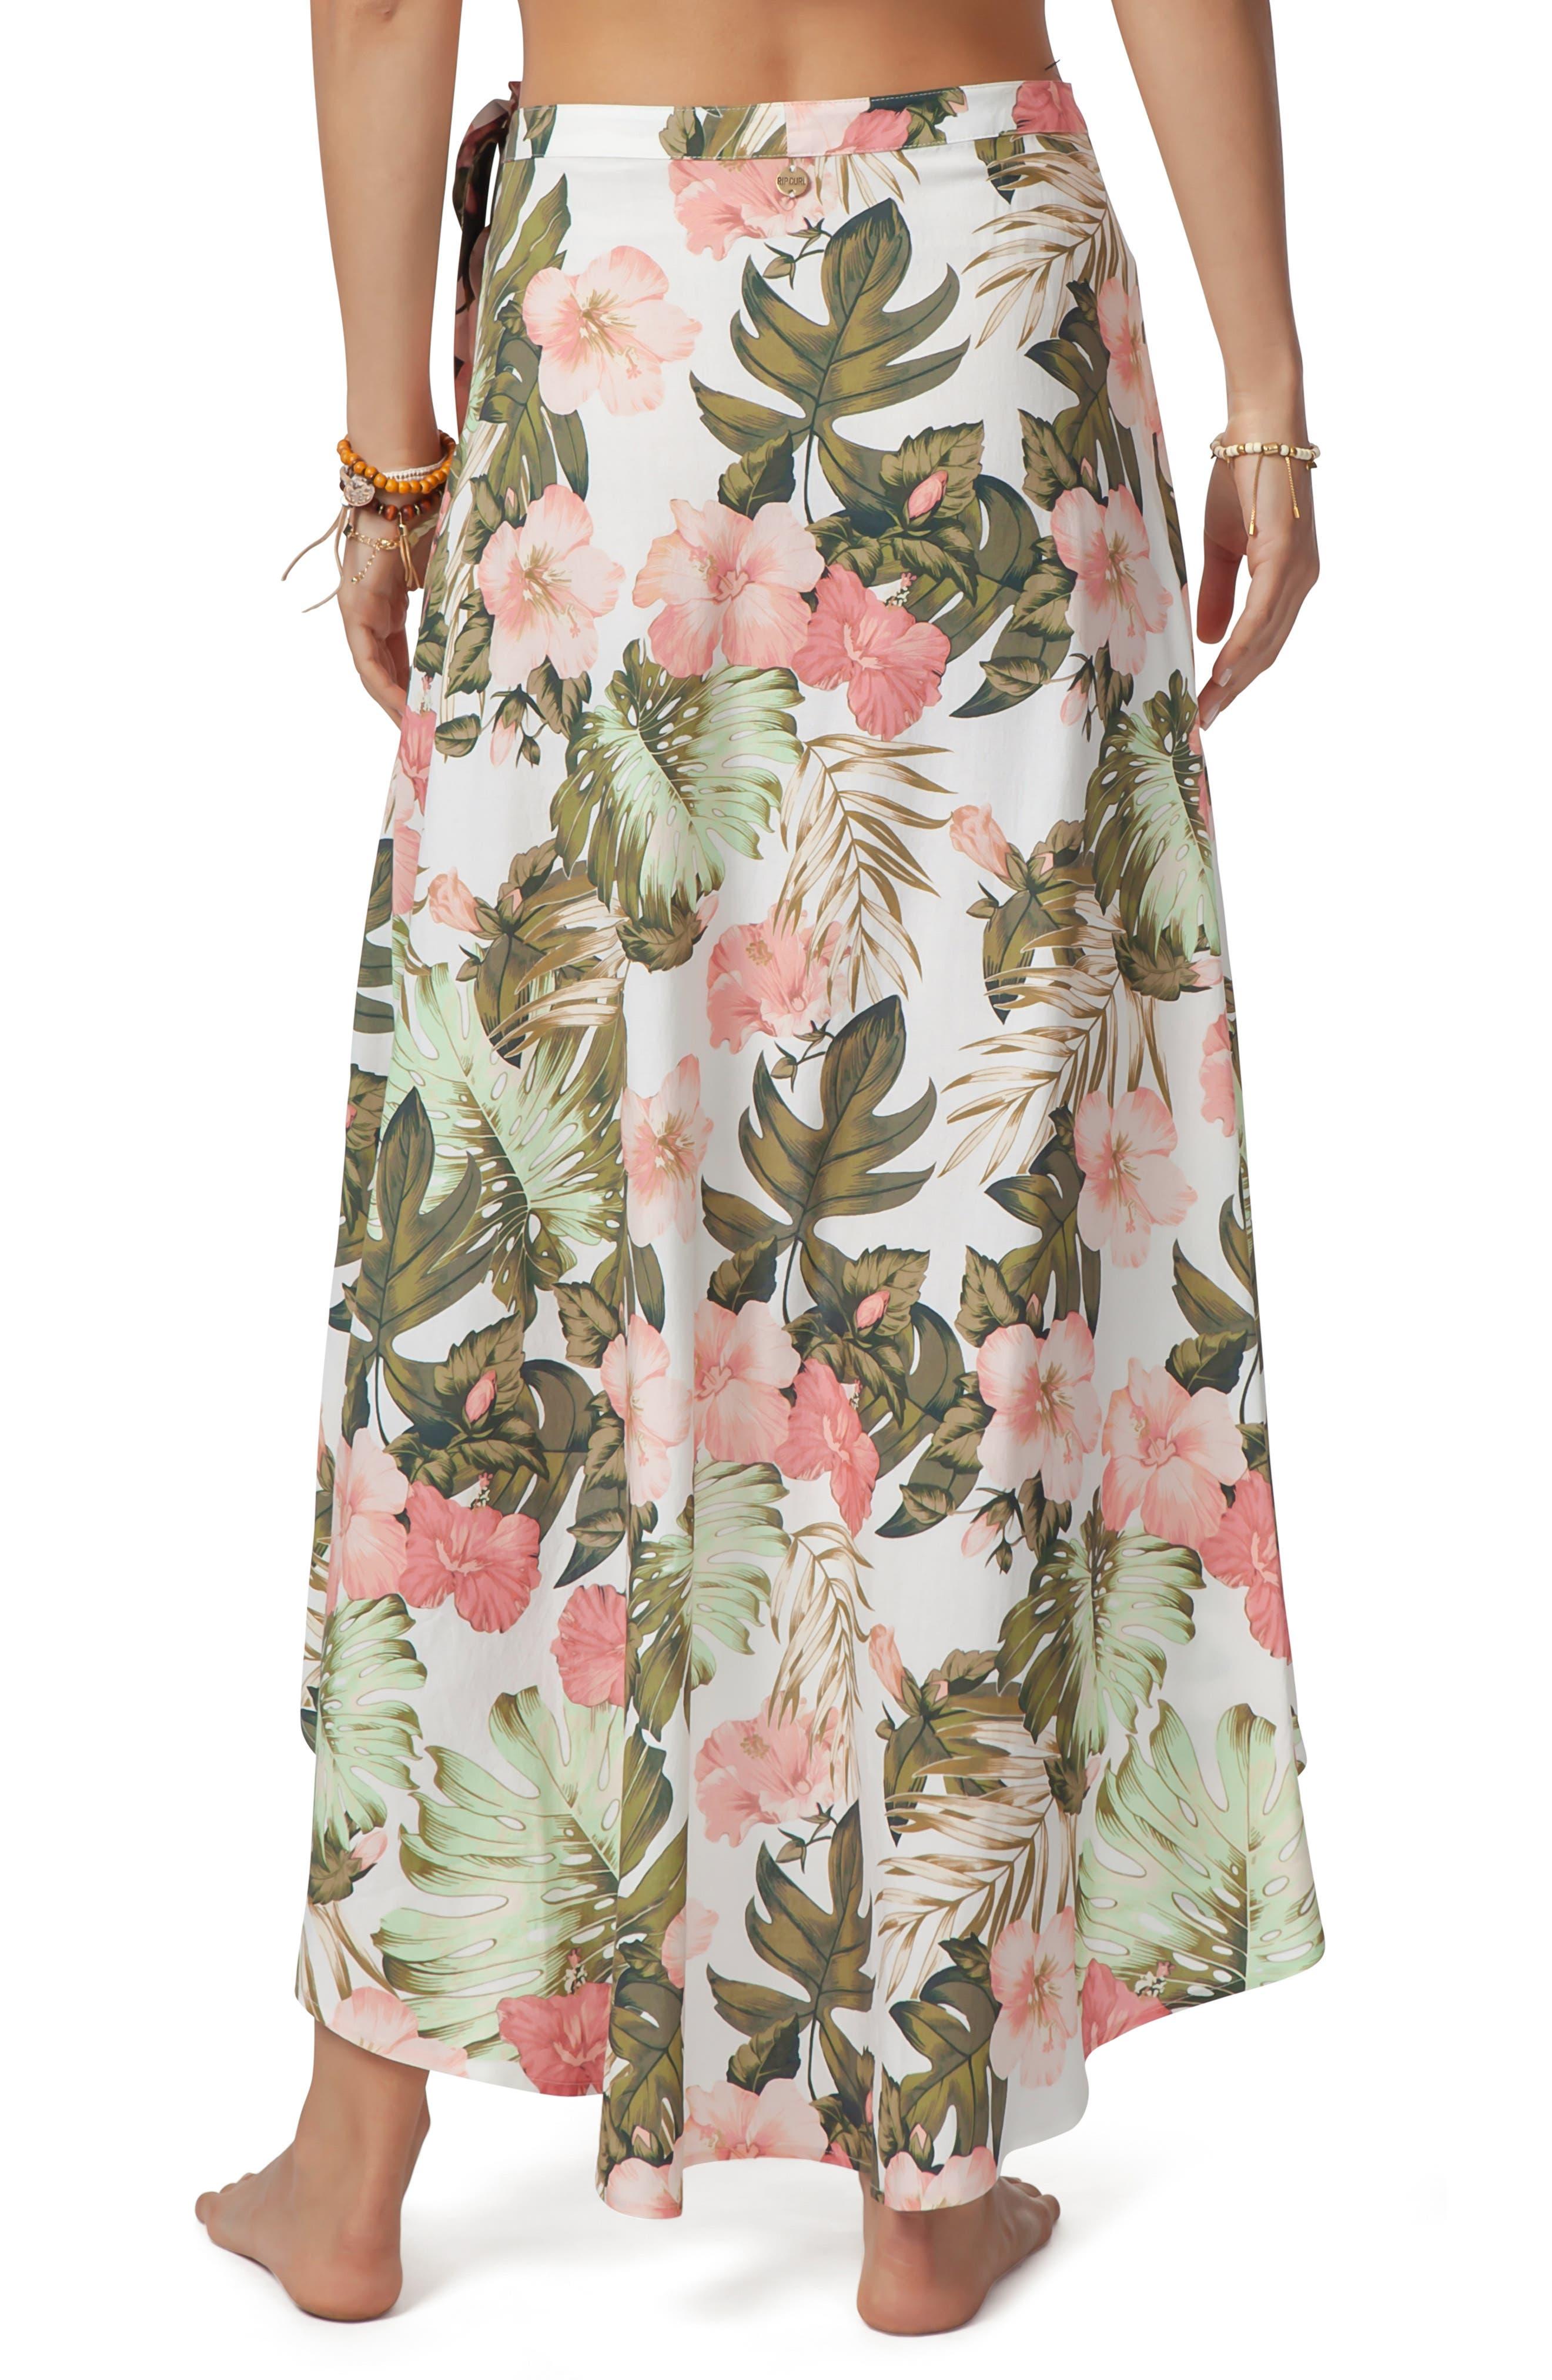 RIP CURL, Hanalei Bay Wrap Skirt, Alternate thumbnail 2, color, 100